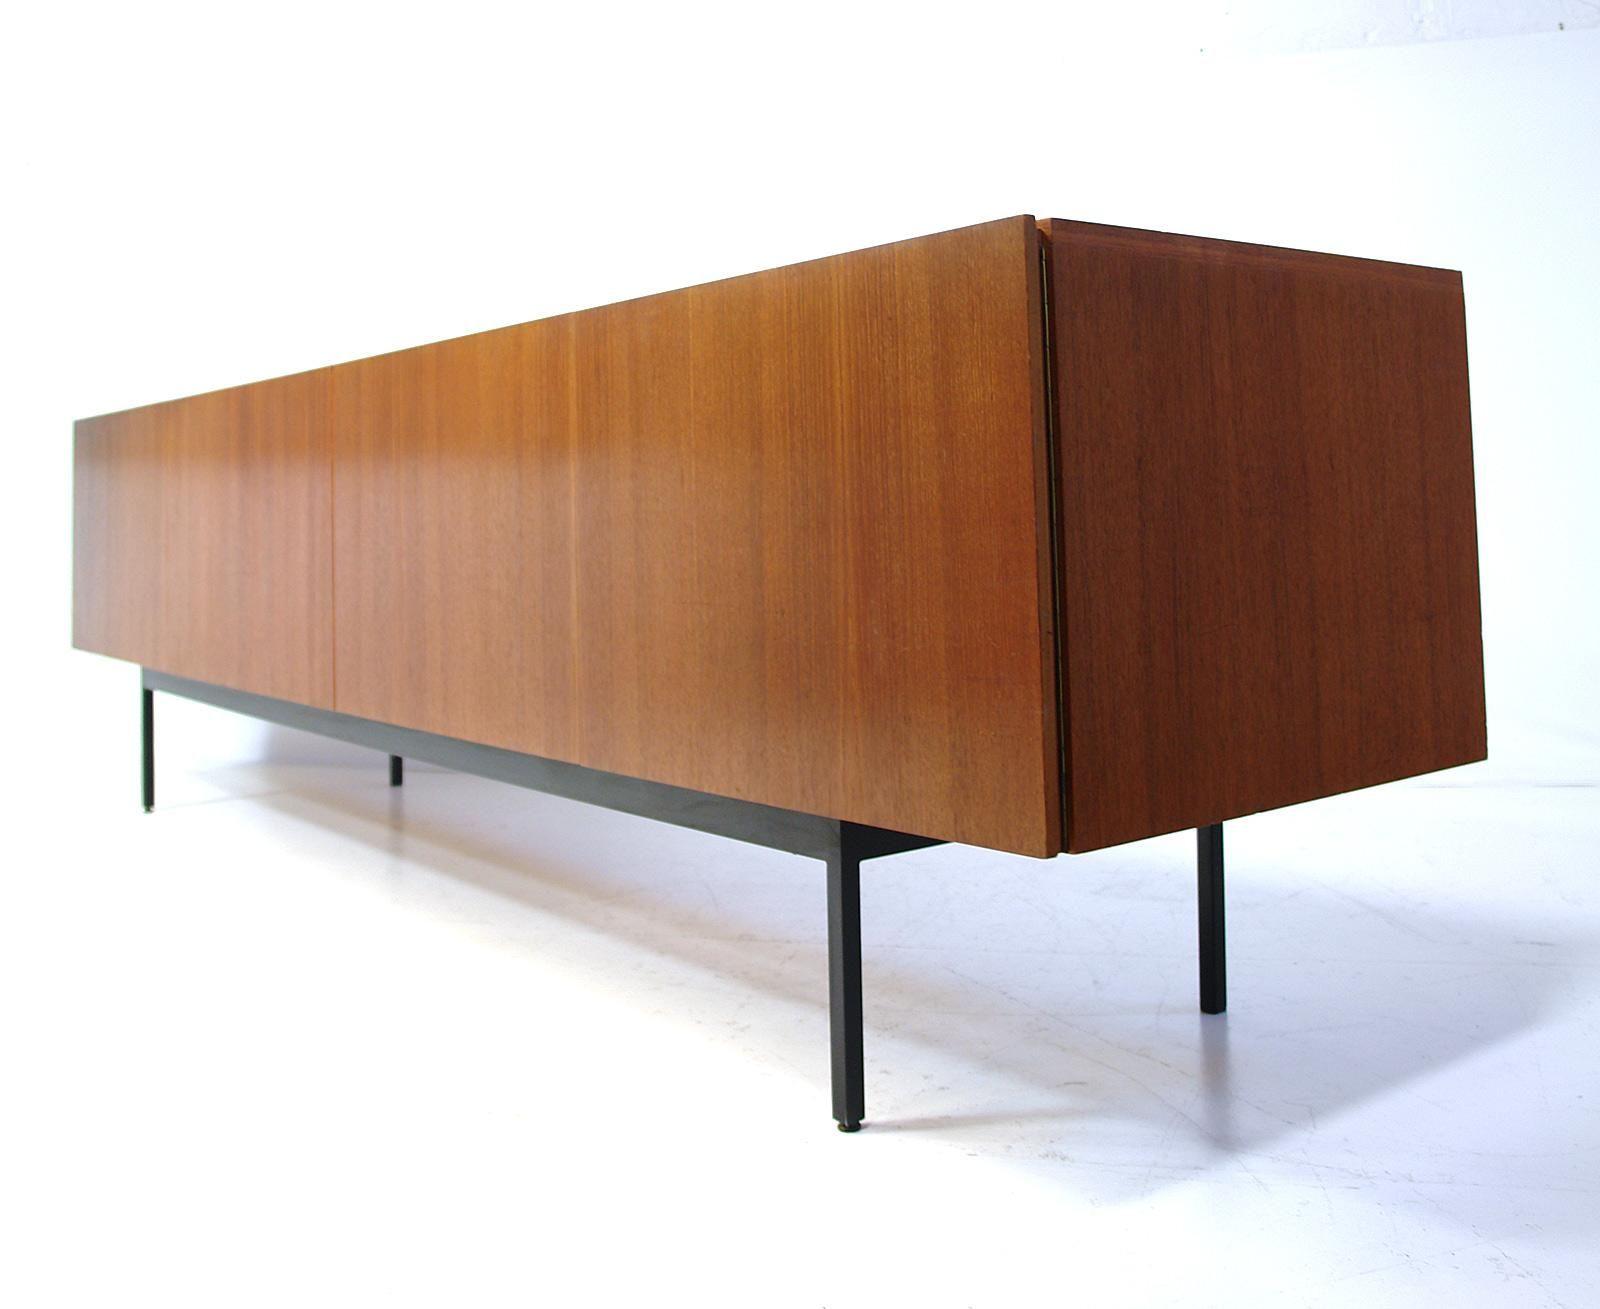 areaneo dieter waeckerlin sideboard b40 behr germany. Black Bedroom Furniture Sets. Home Design Ideas